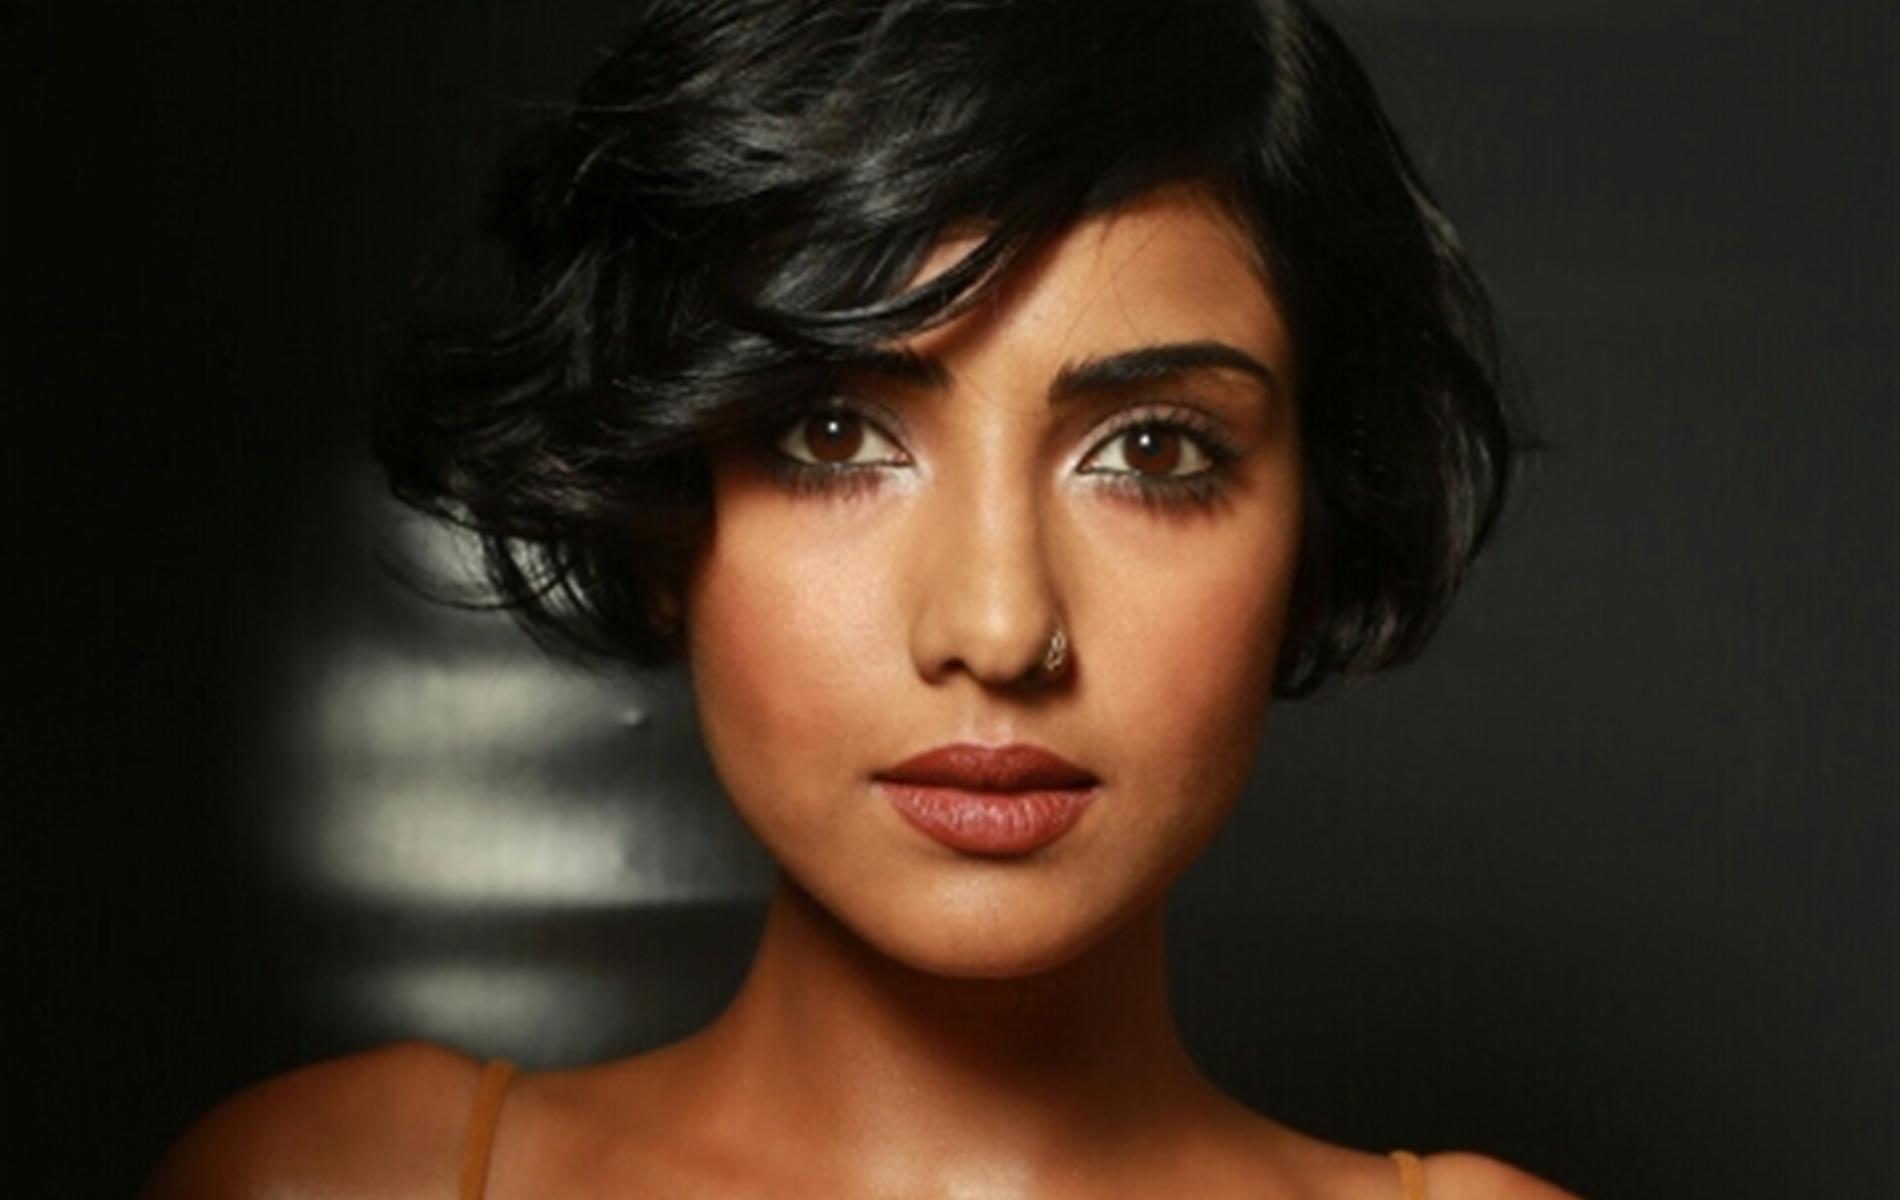 Teena Singh The New Face Of Nescafe After Deepika Padukone? photo